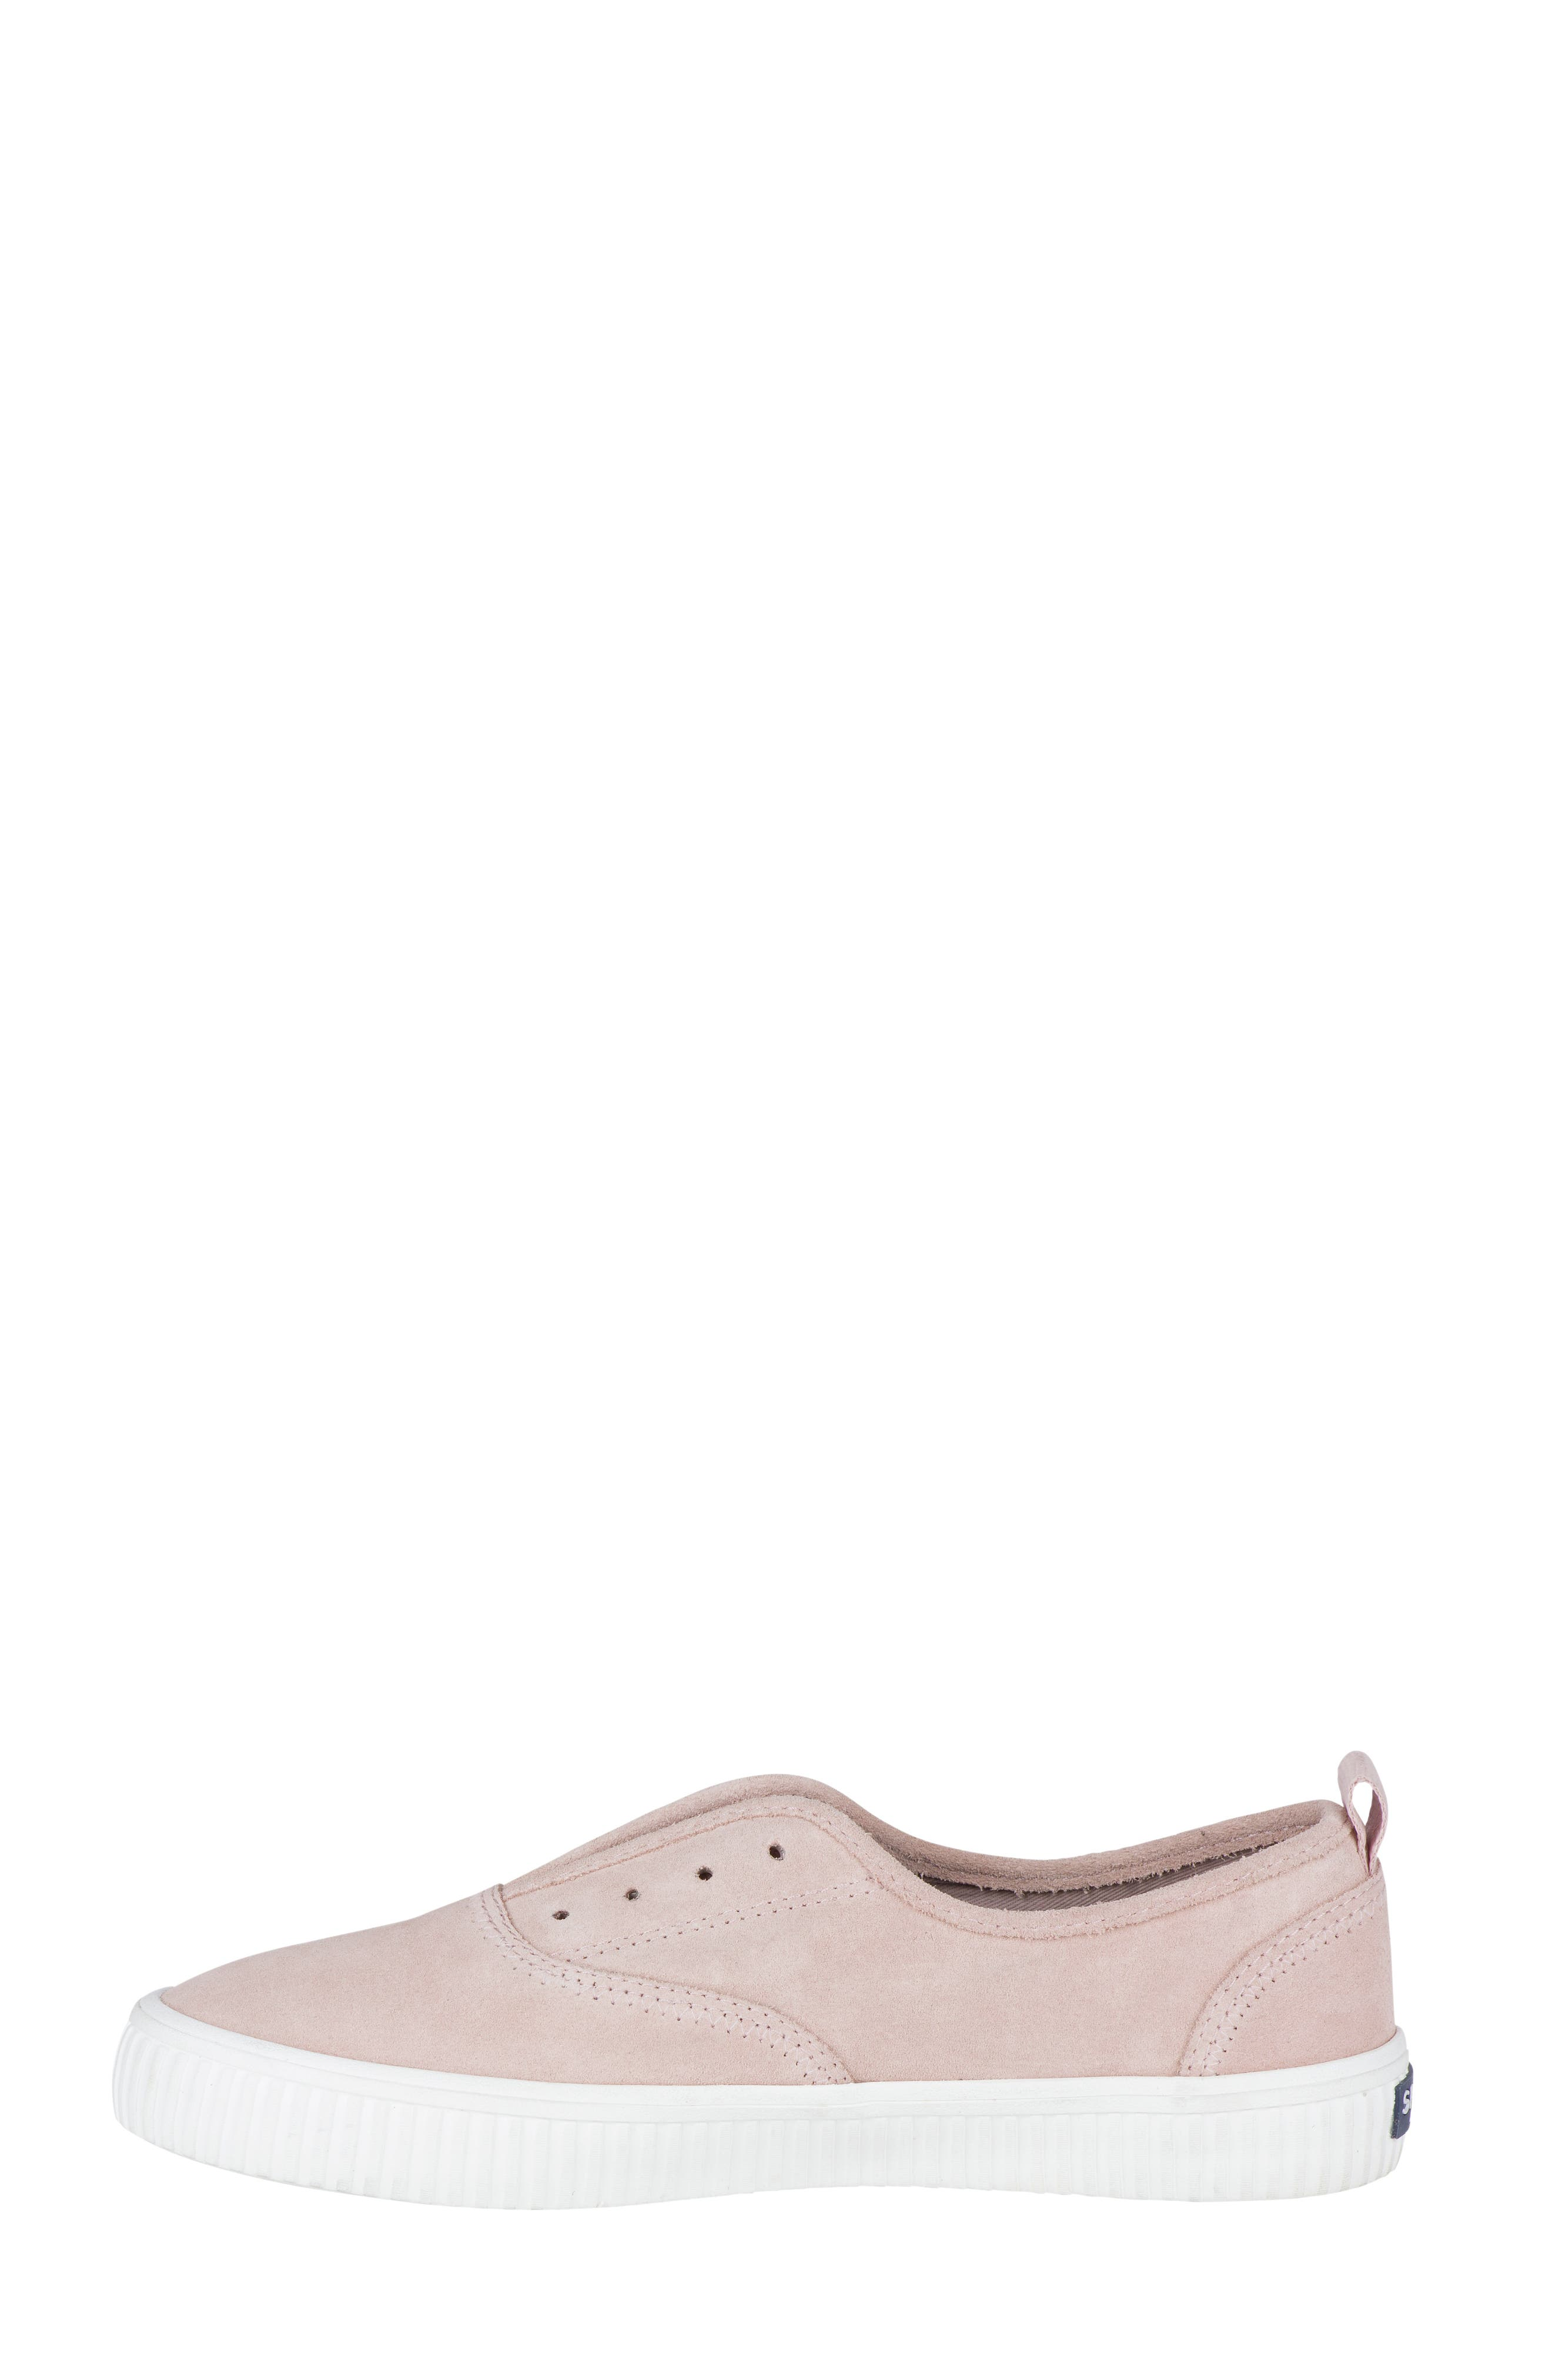 Crest Creeper Slip-On Sneaker,                             Alternate thumbnail 3, color,                             Rose Dust Suede